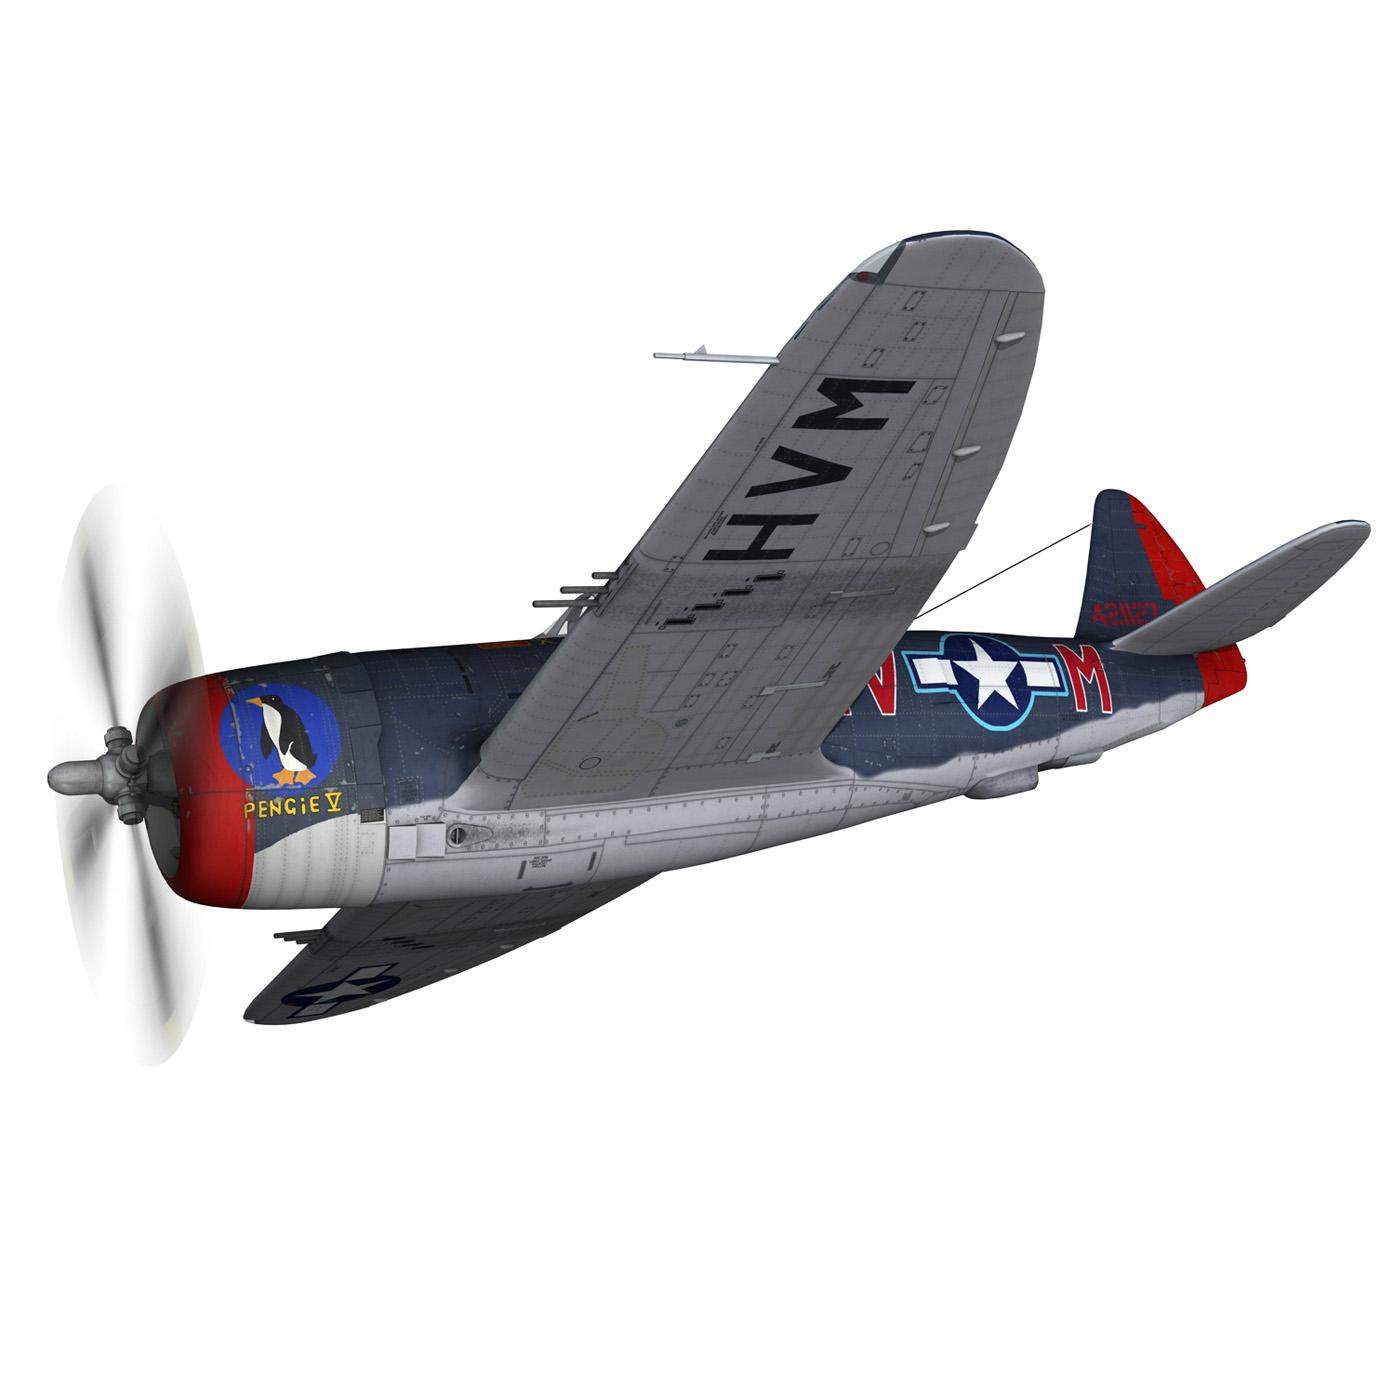 republic p-47m thunderbolt – pengie v 3d model 3ds c4d fbx lwo lw lws obj 279717